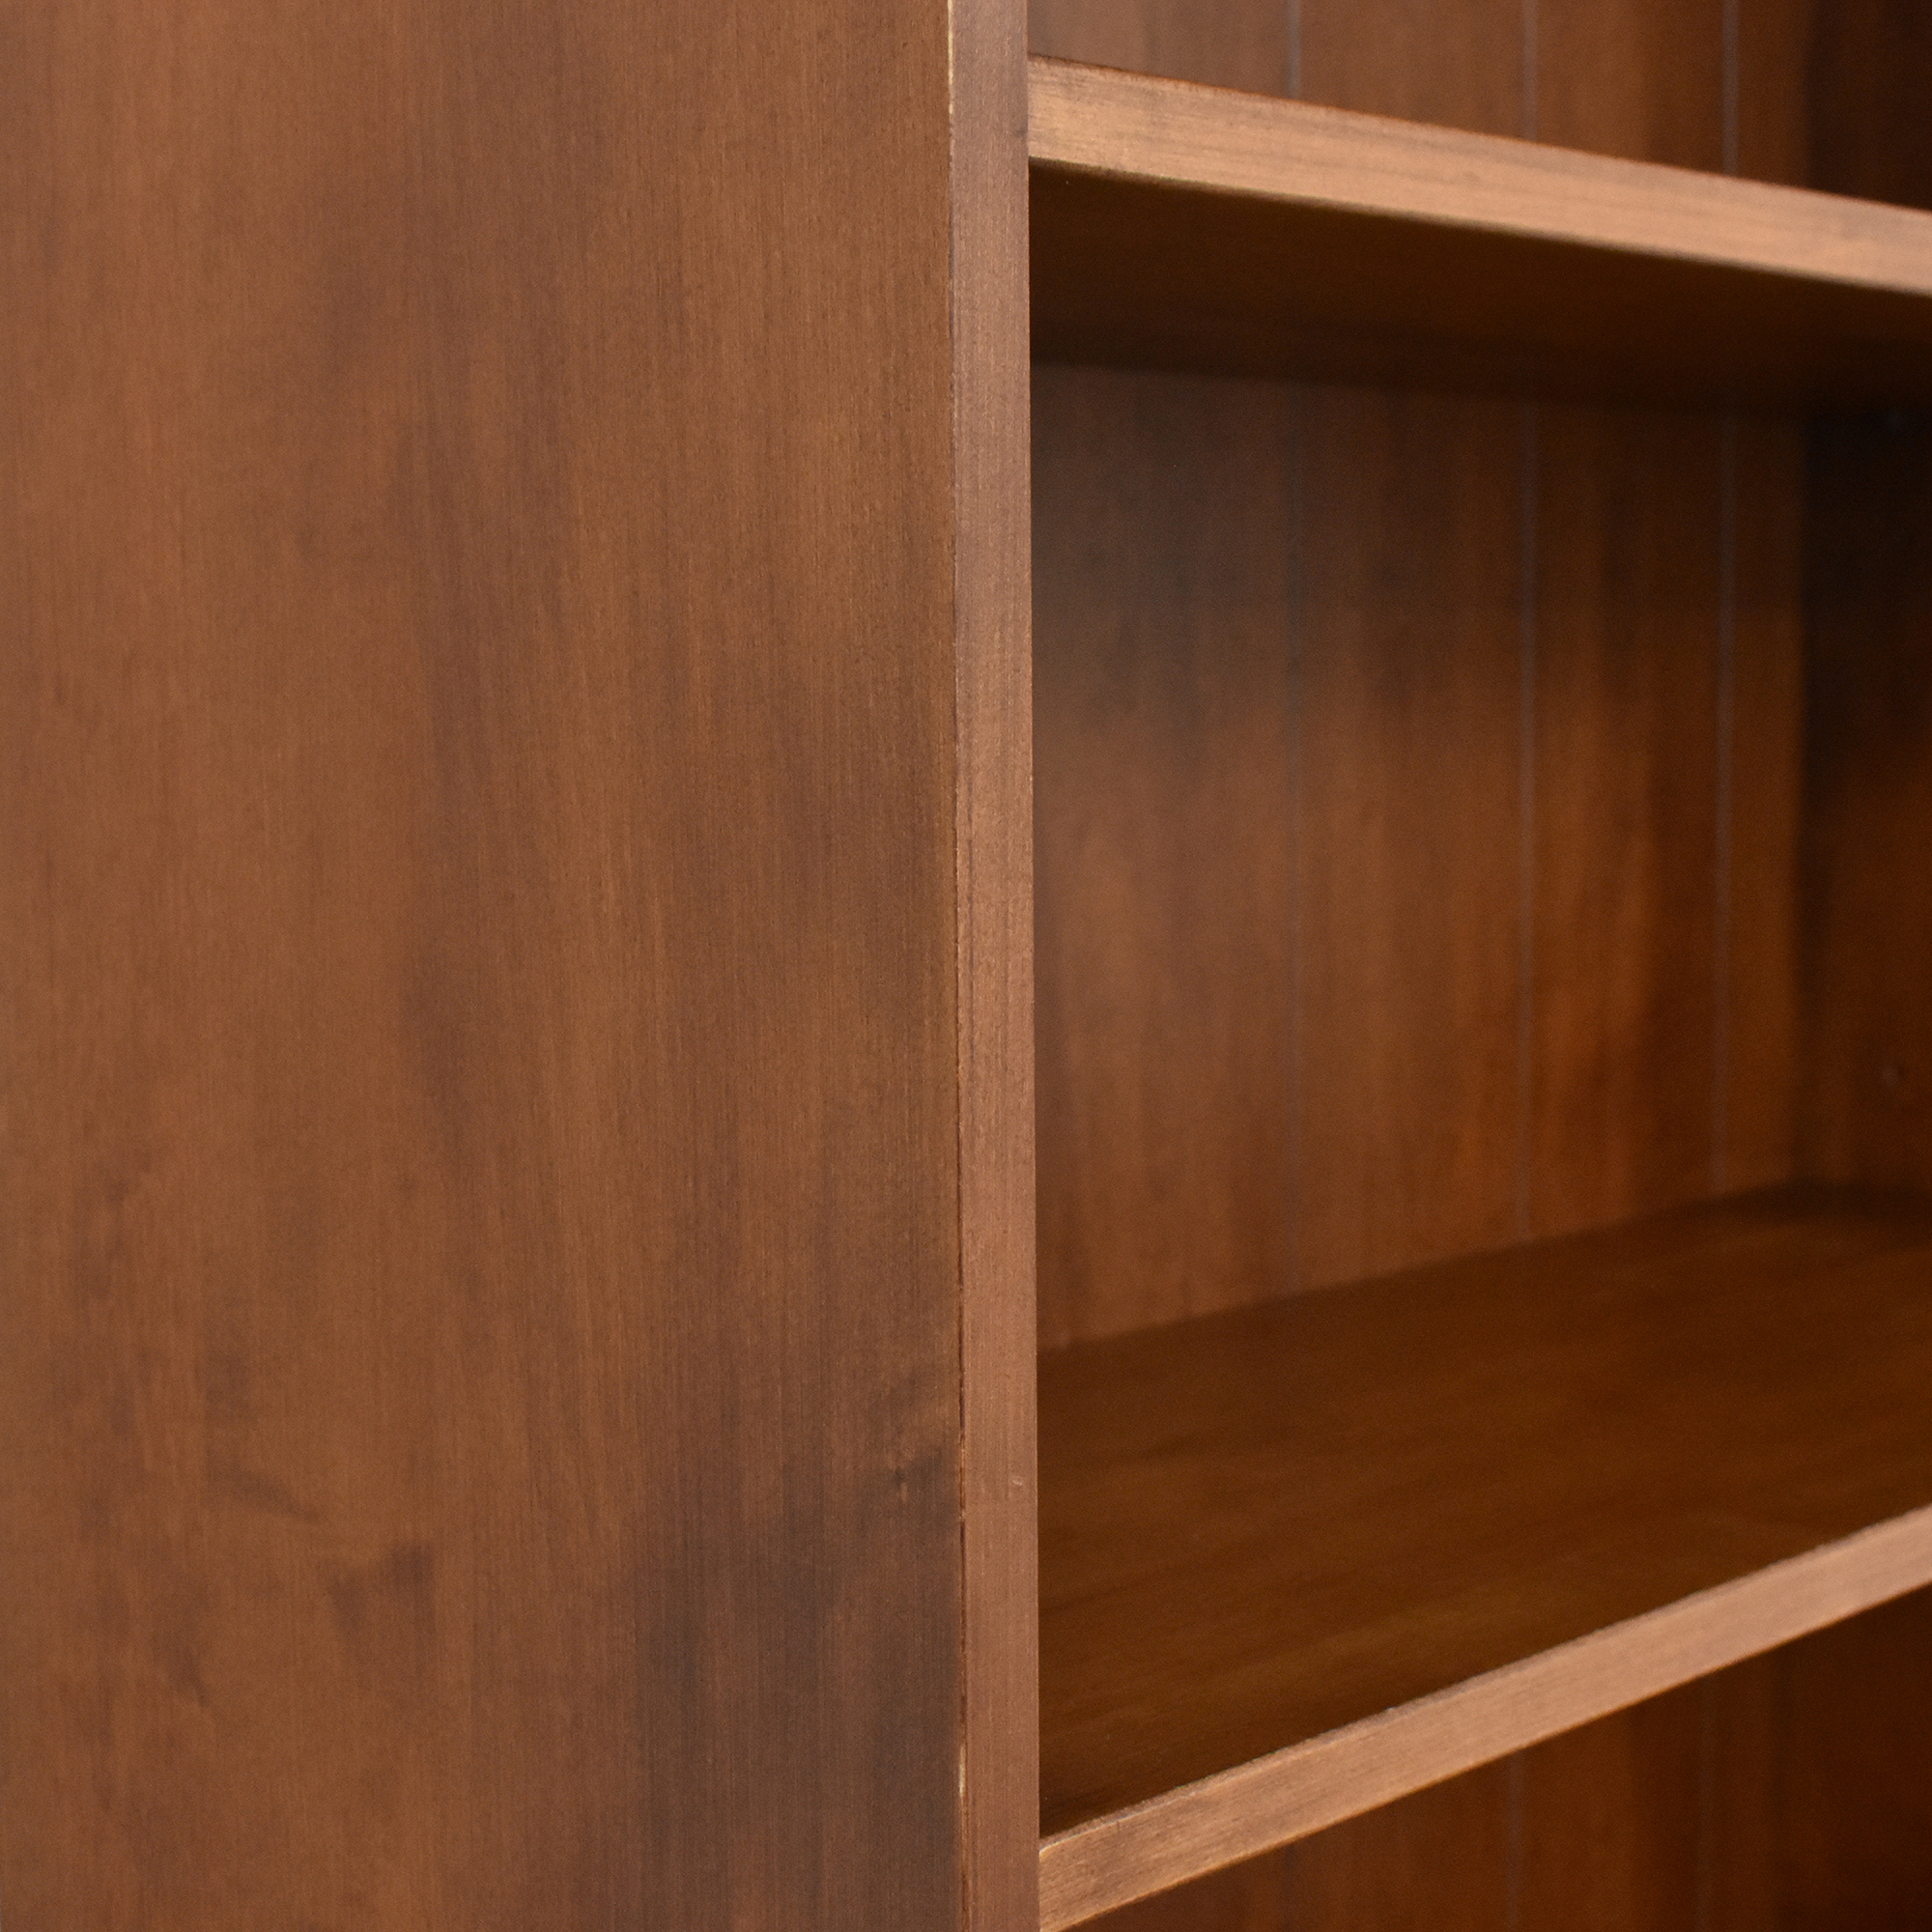 Ethan Allen Crawford Tall Bookcase / Storage